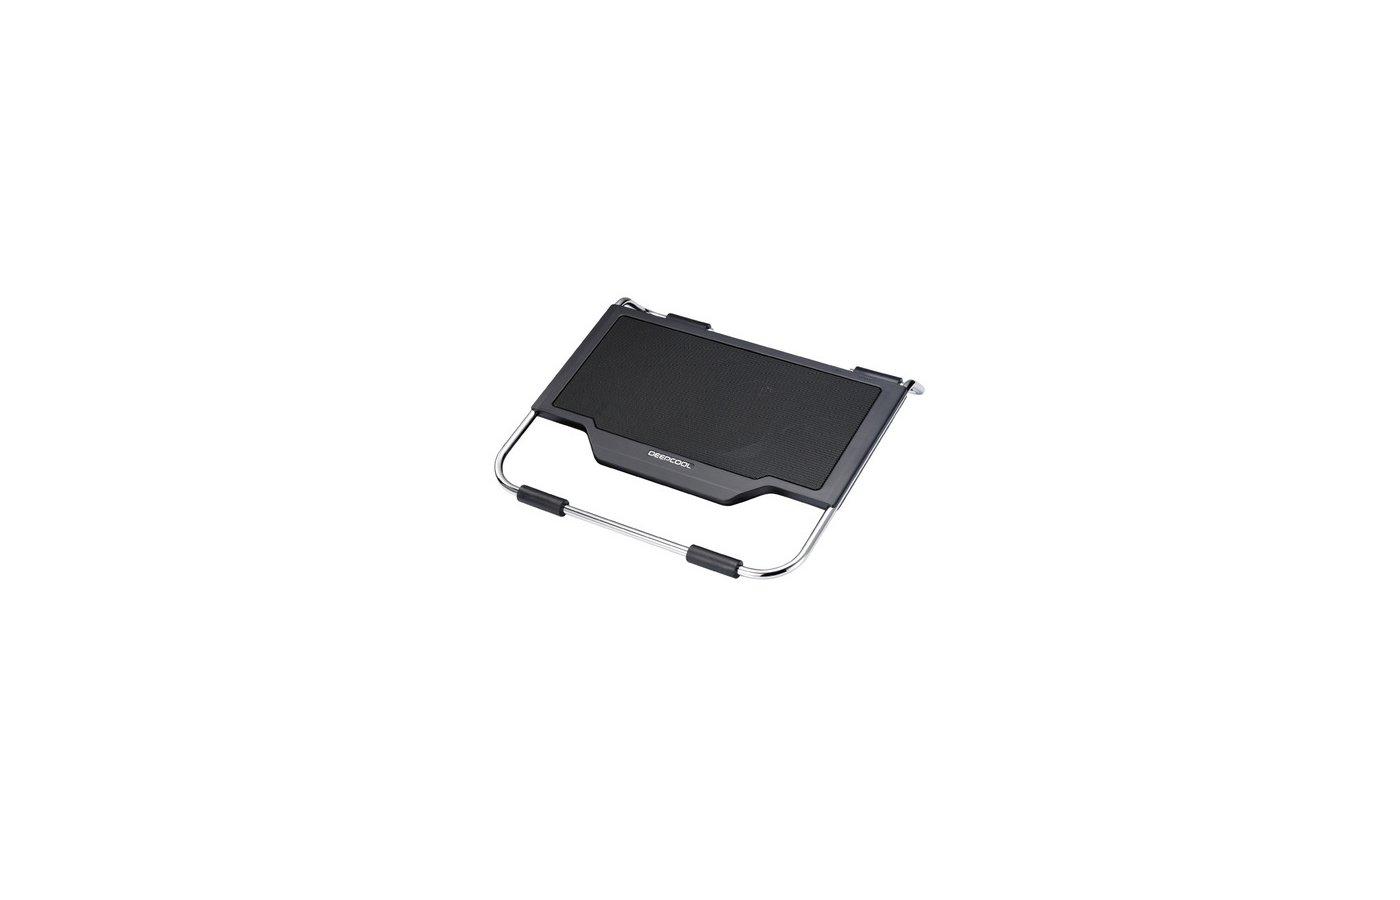 Подставка для ноутбука Deepcool N2000 FS Подставка для охлаждения ноутбука